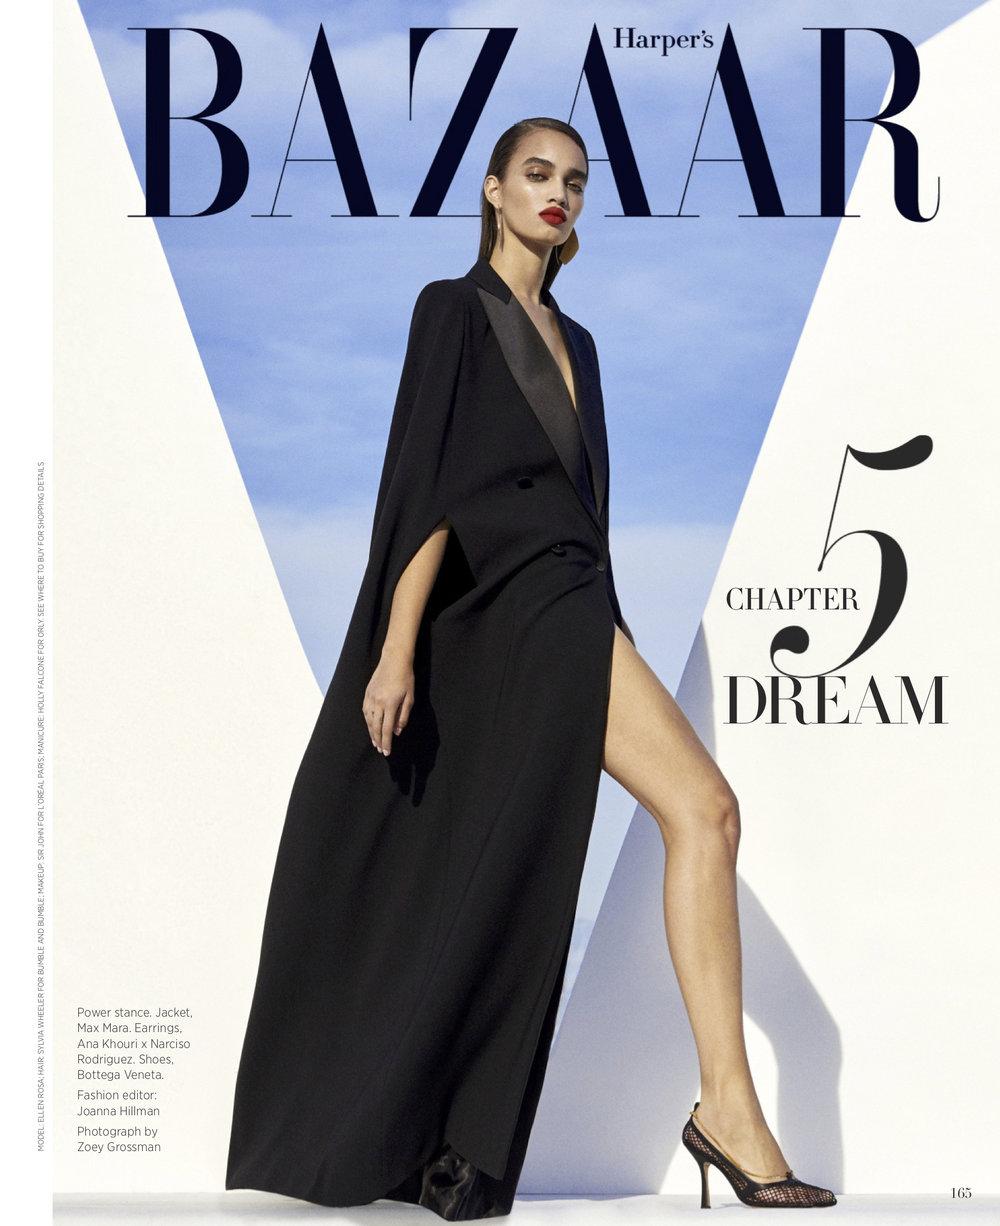 Harper's Bazaar May 2019 Richard Earrings.jpg